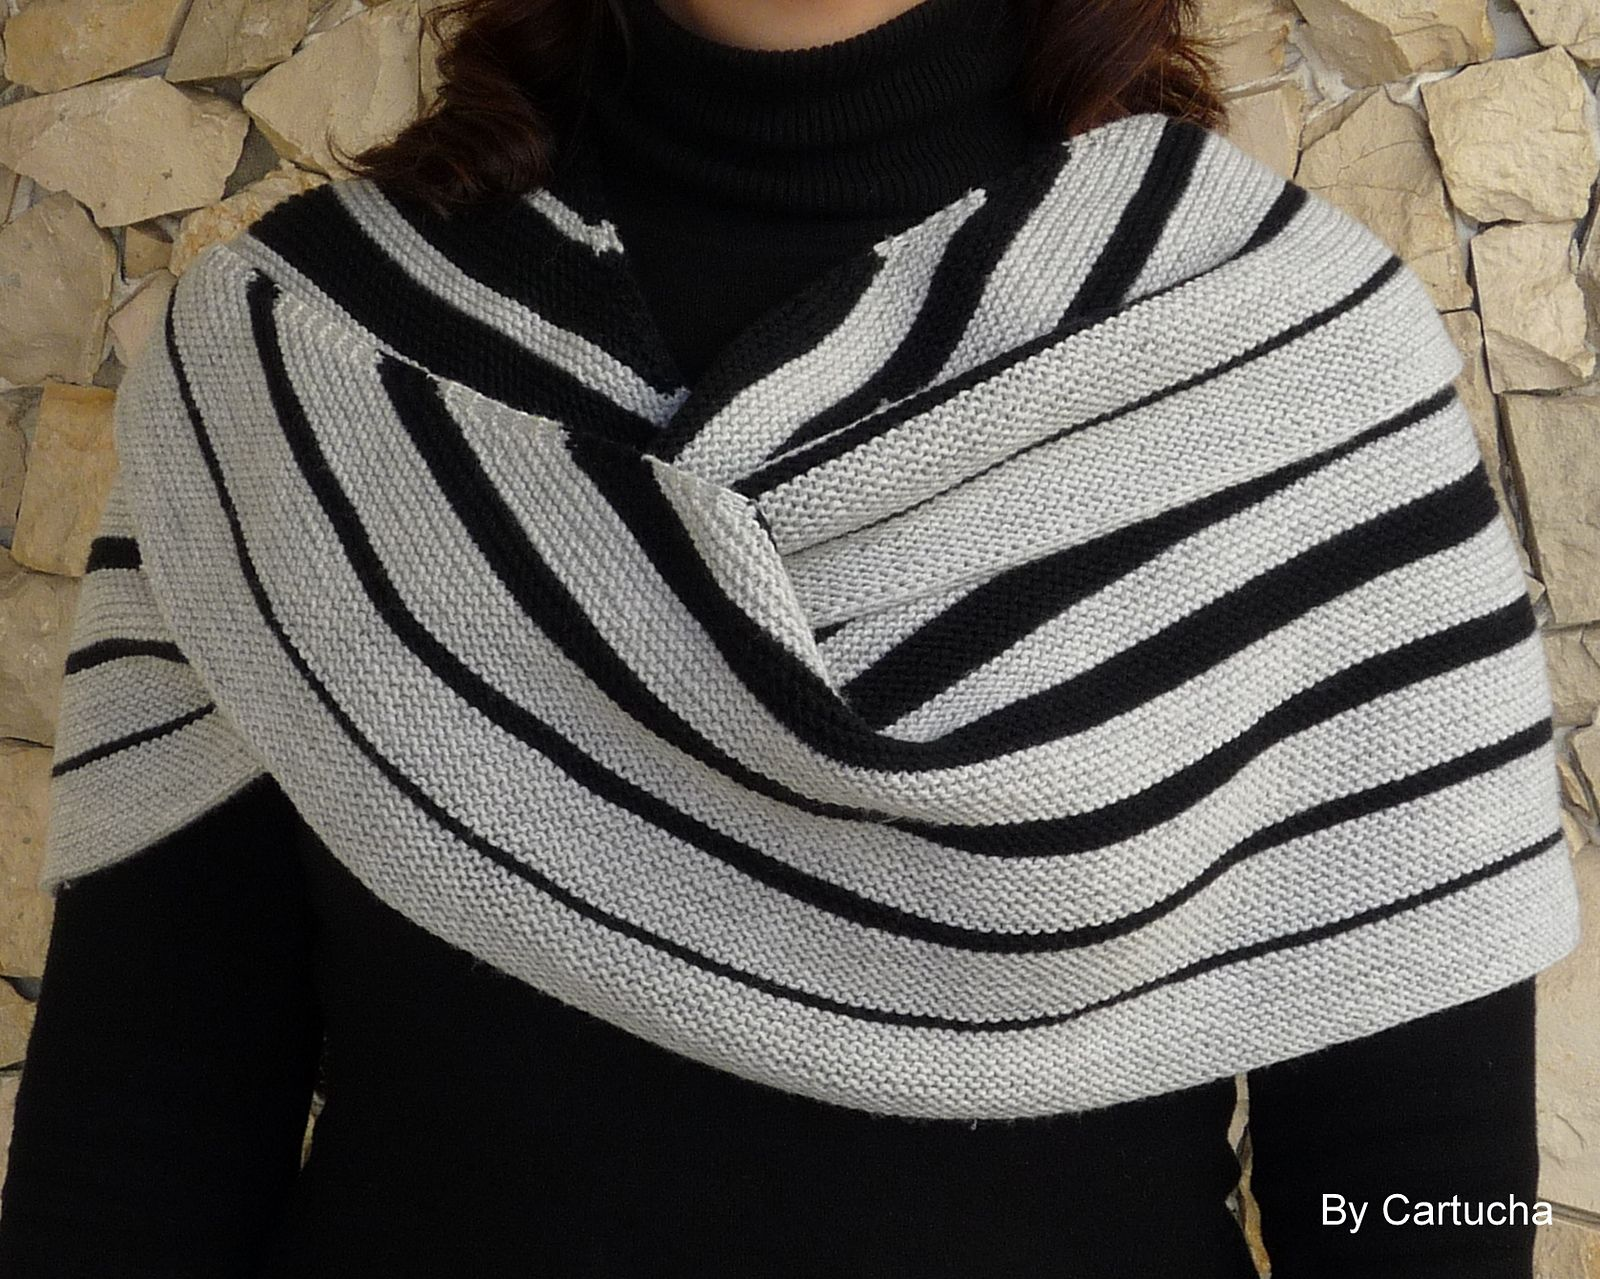 Ravelry: Cartucha's Miara shawl - test knit